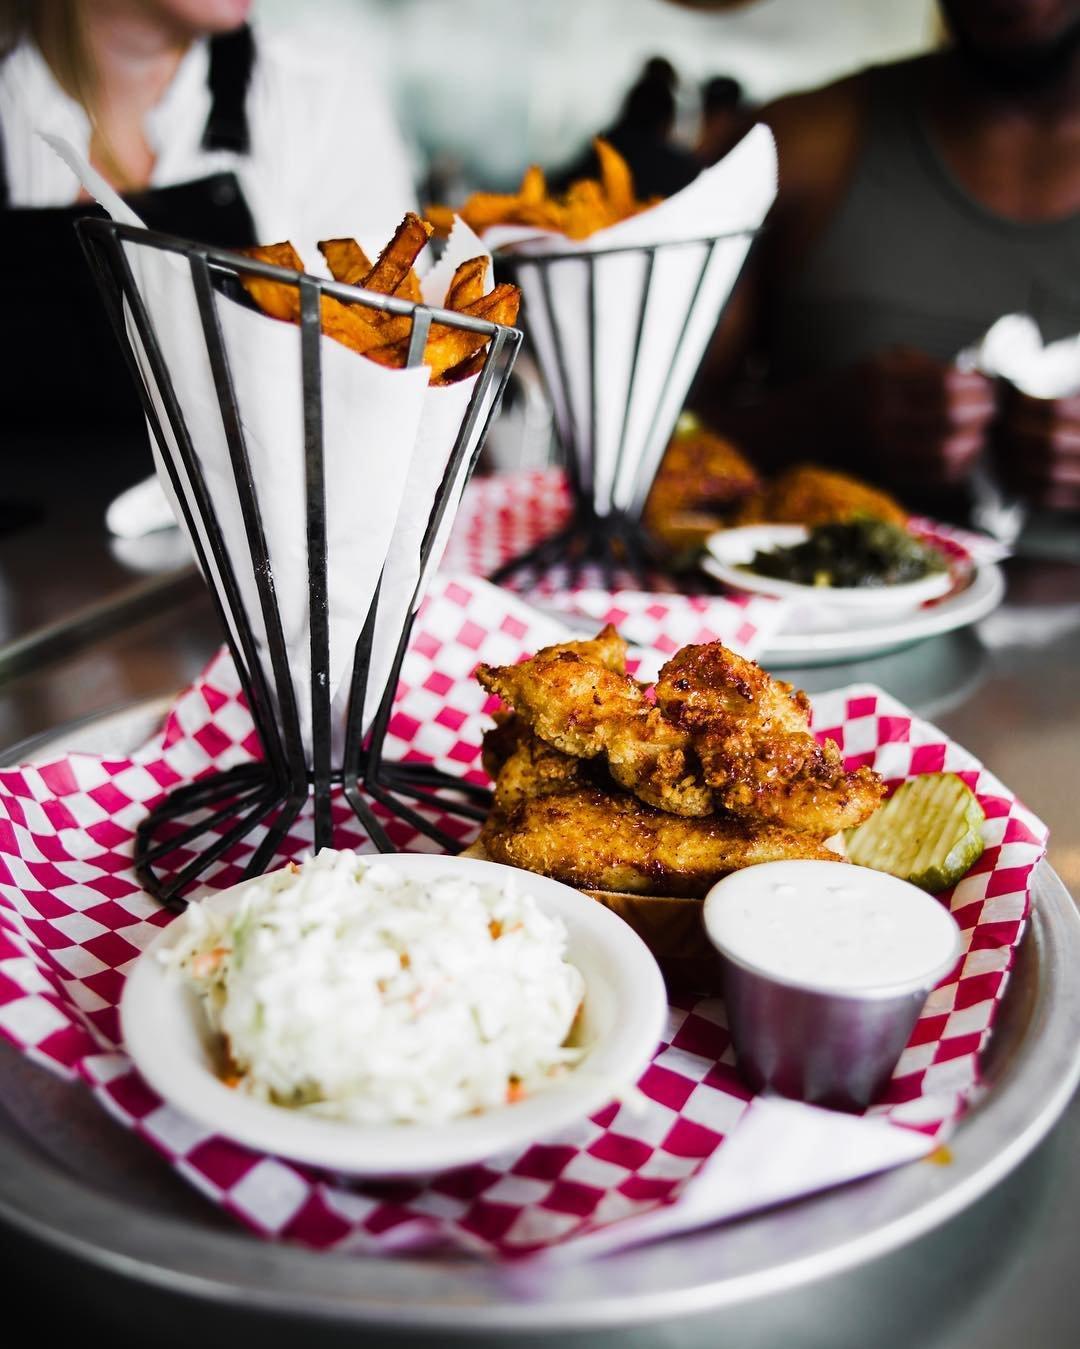 Asheville Restaurants - Rocky's Hot Chicken Shack (Patton Location) - Original Photo